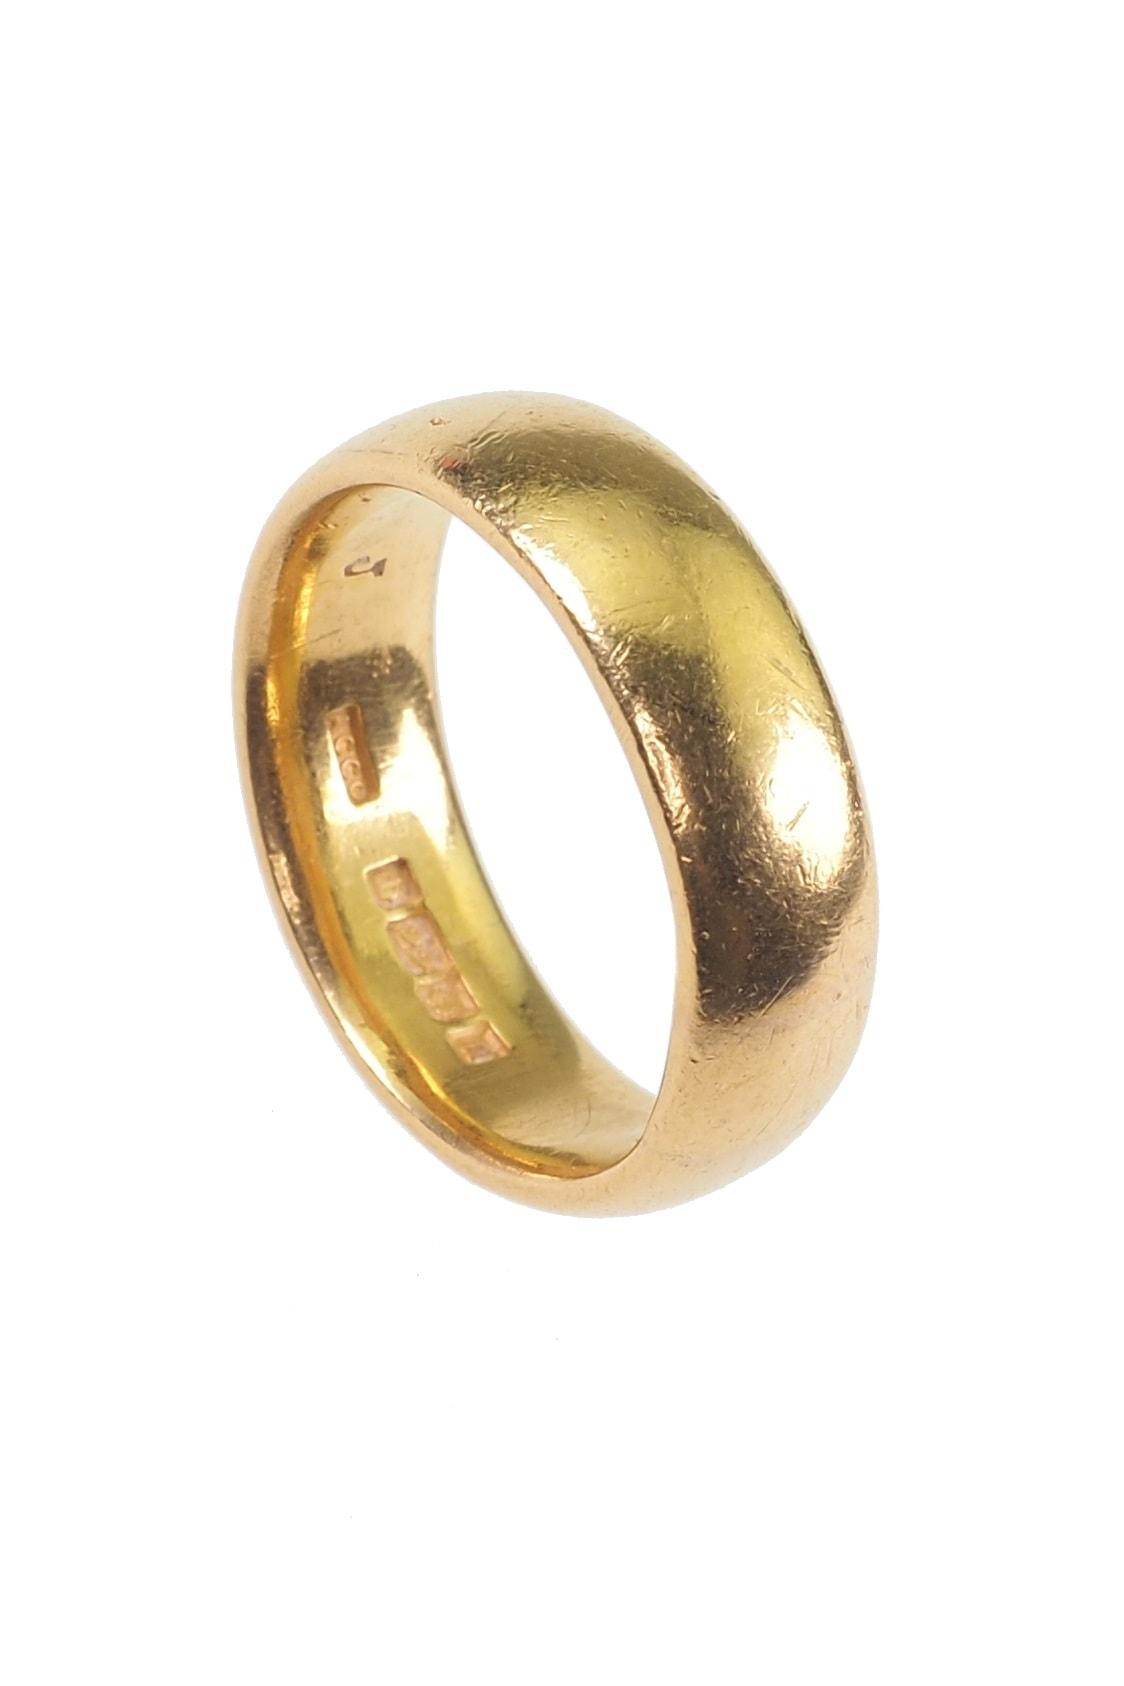 antike-Goldeheringe-kaufen-0494a